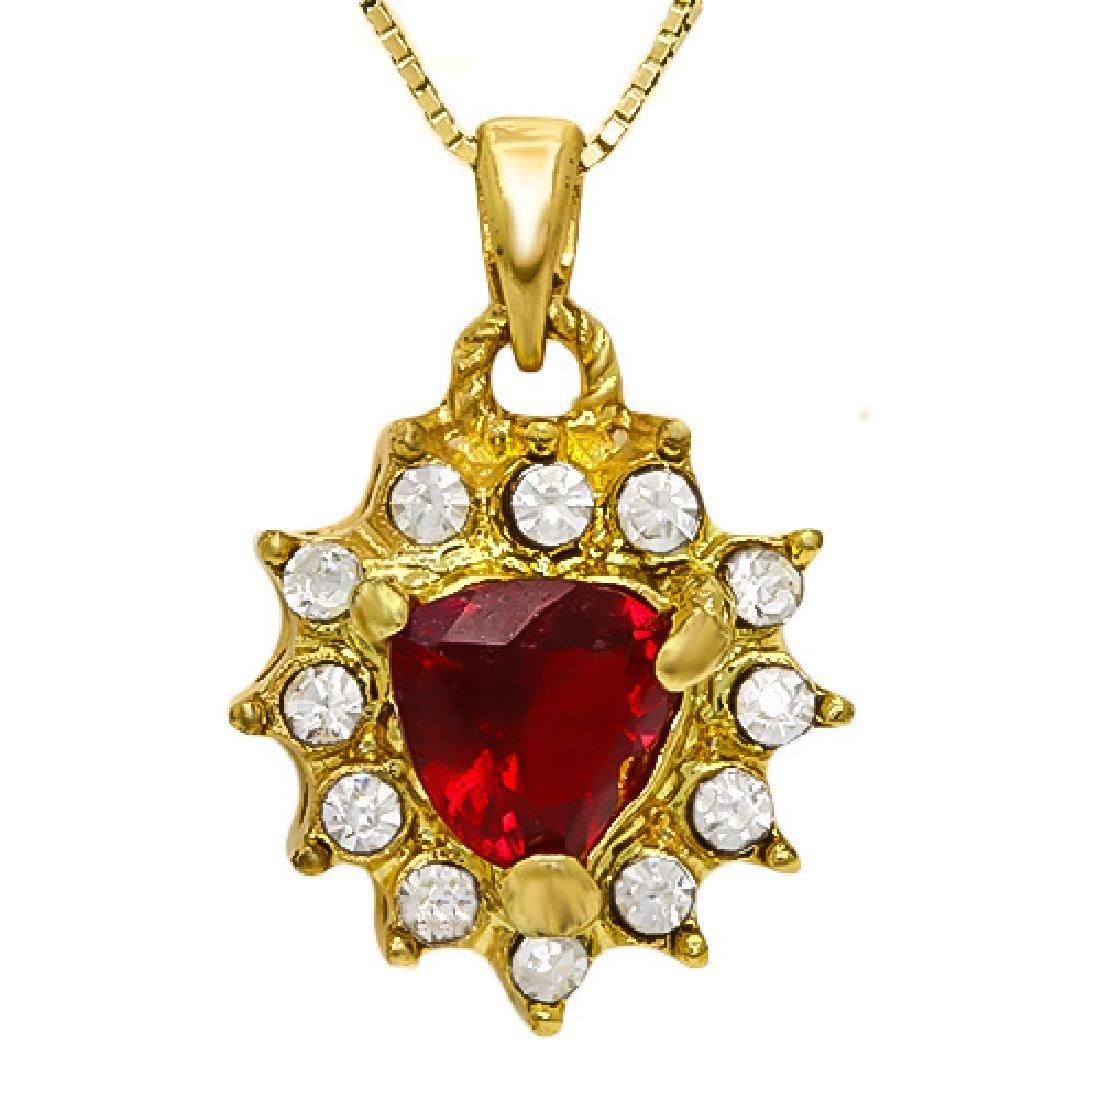 CREATED RUBY & FLAWLESS CREATED DIAMOND 18K GOLD PLATED